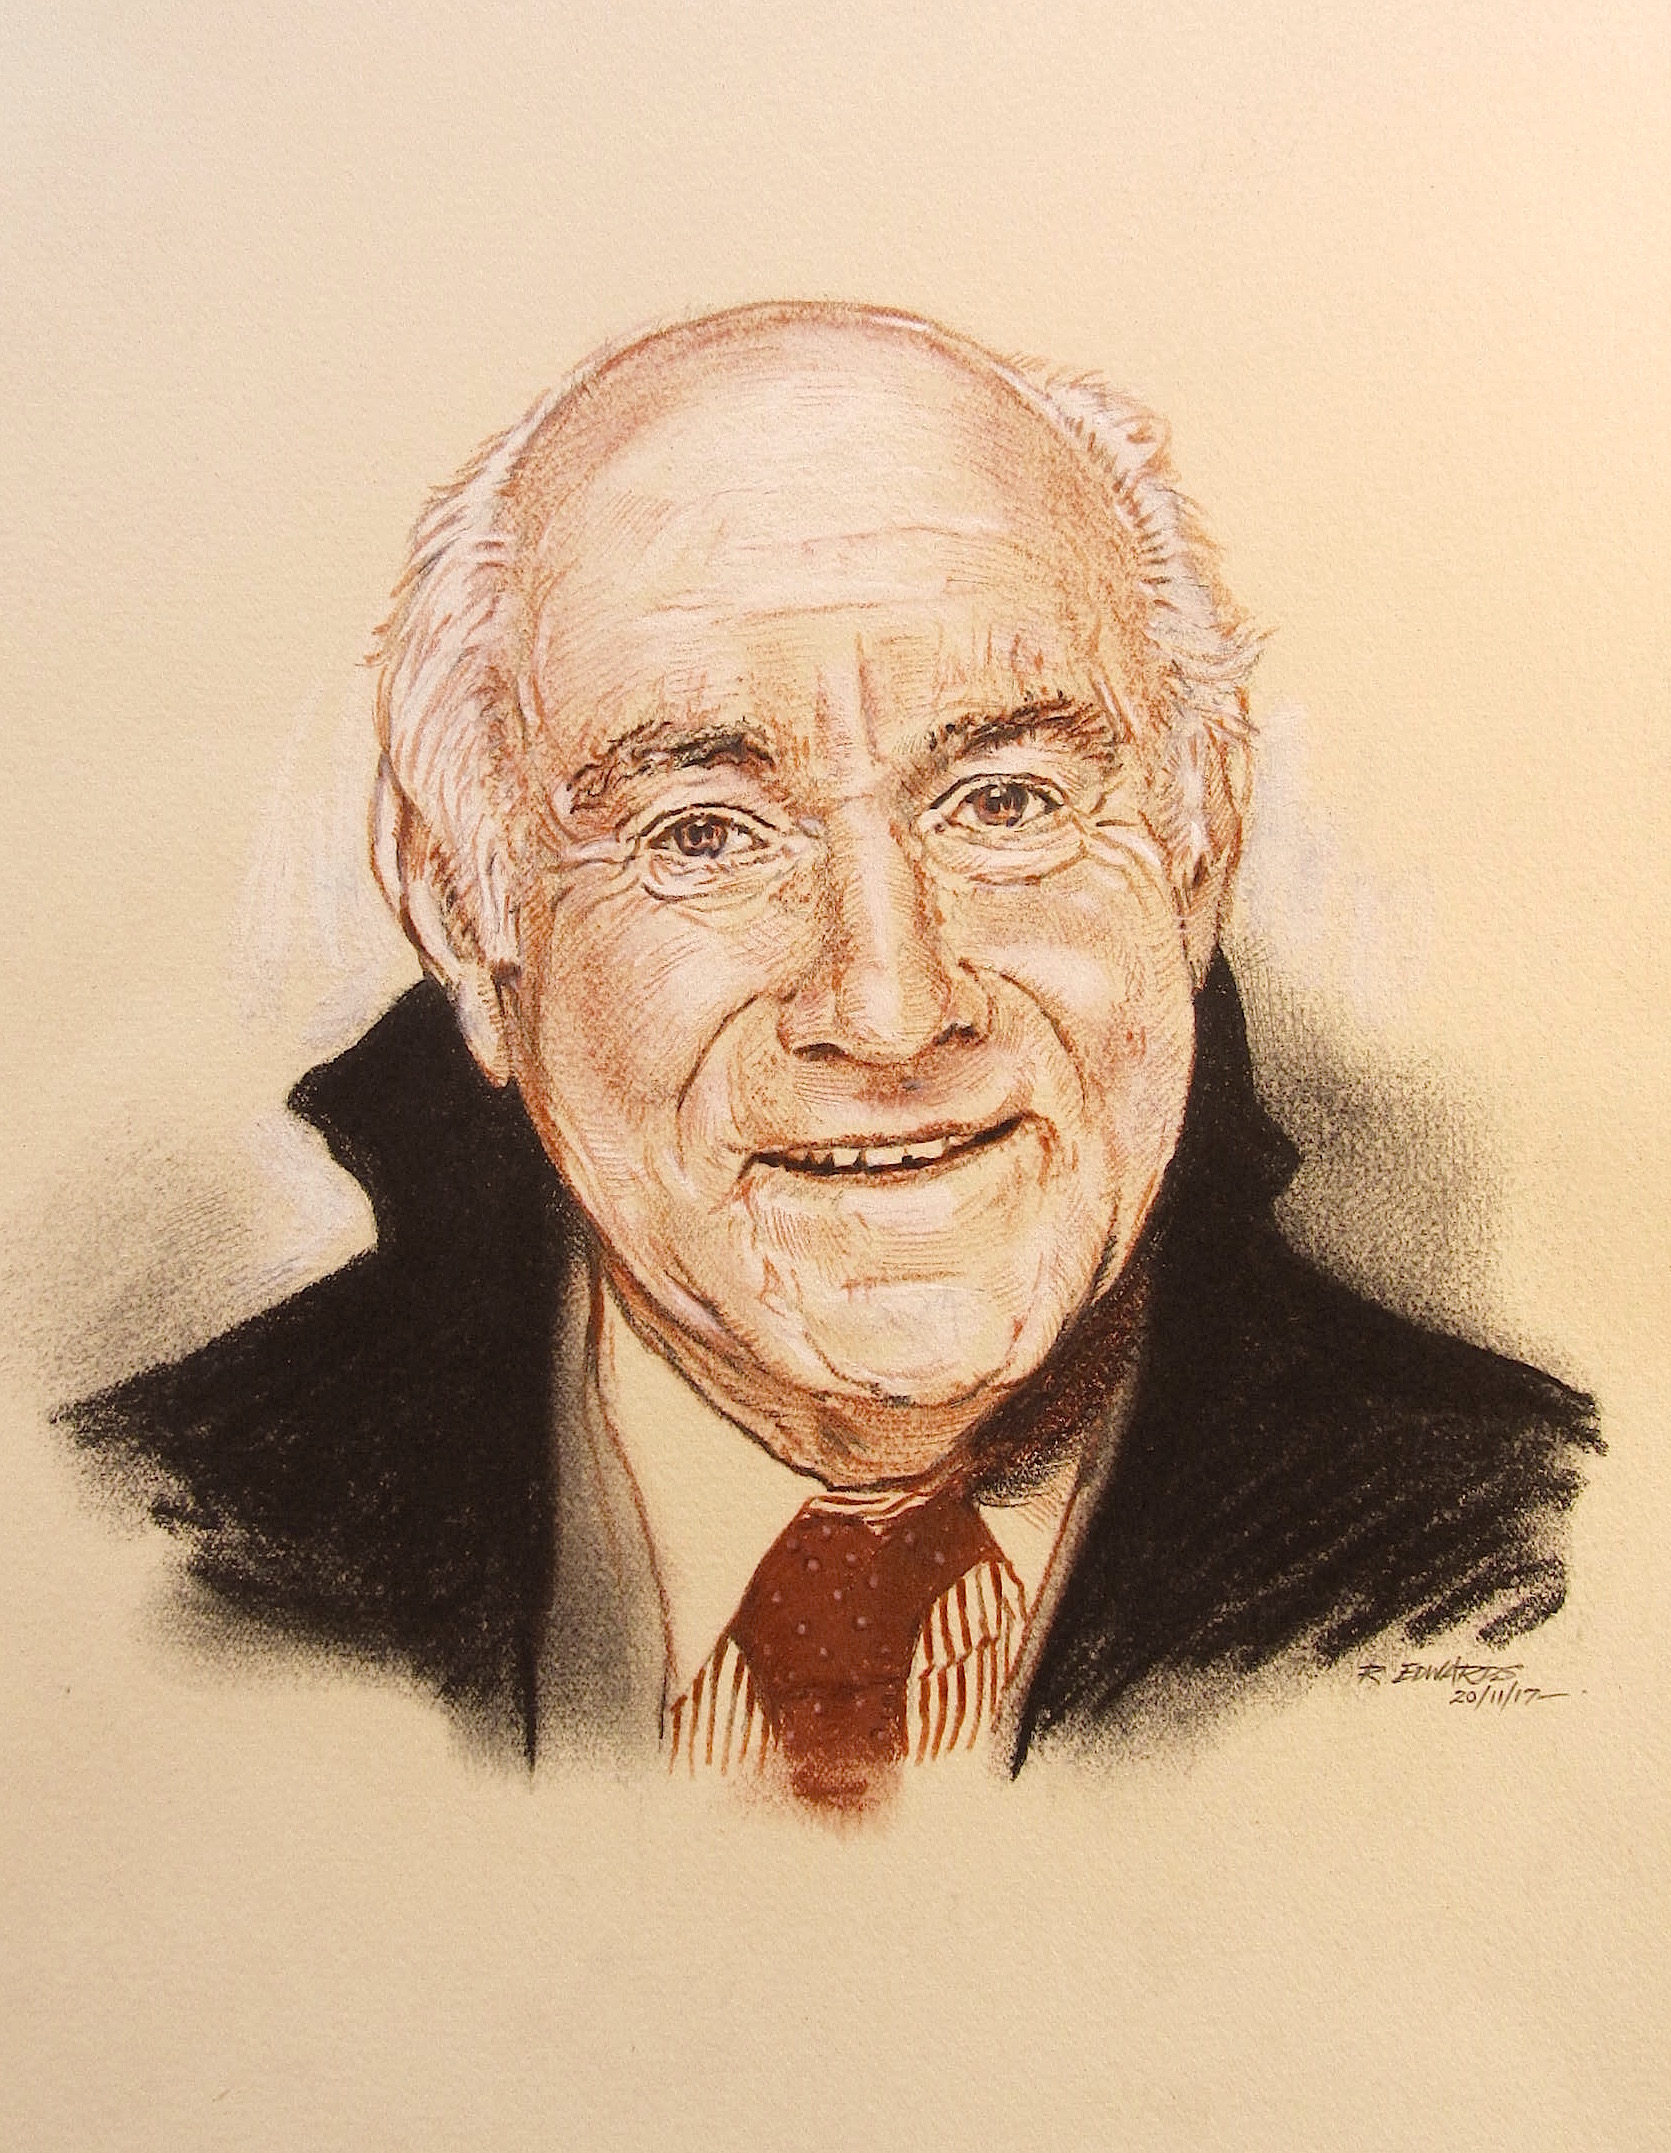 Pierre M. Rosenberg